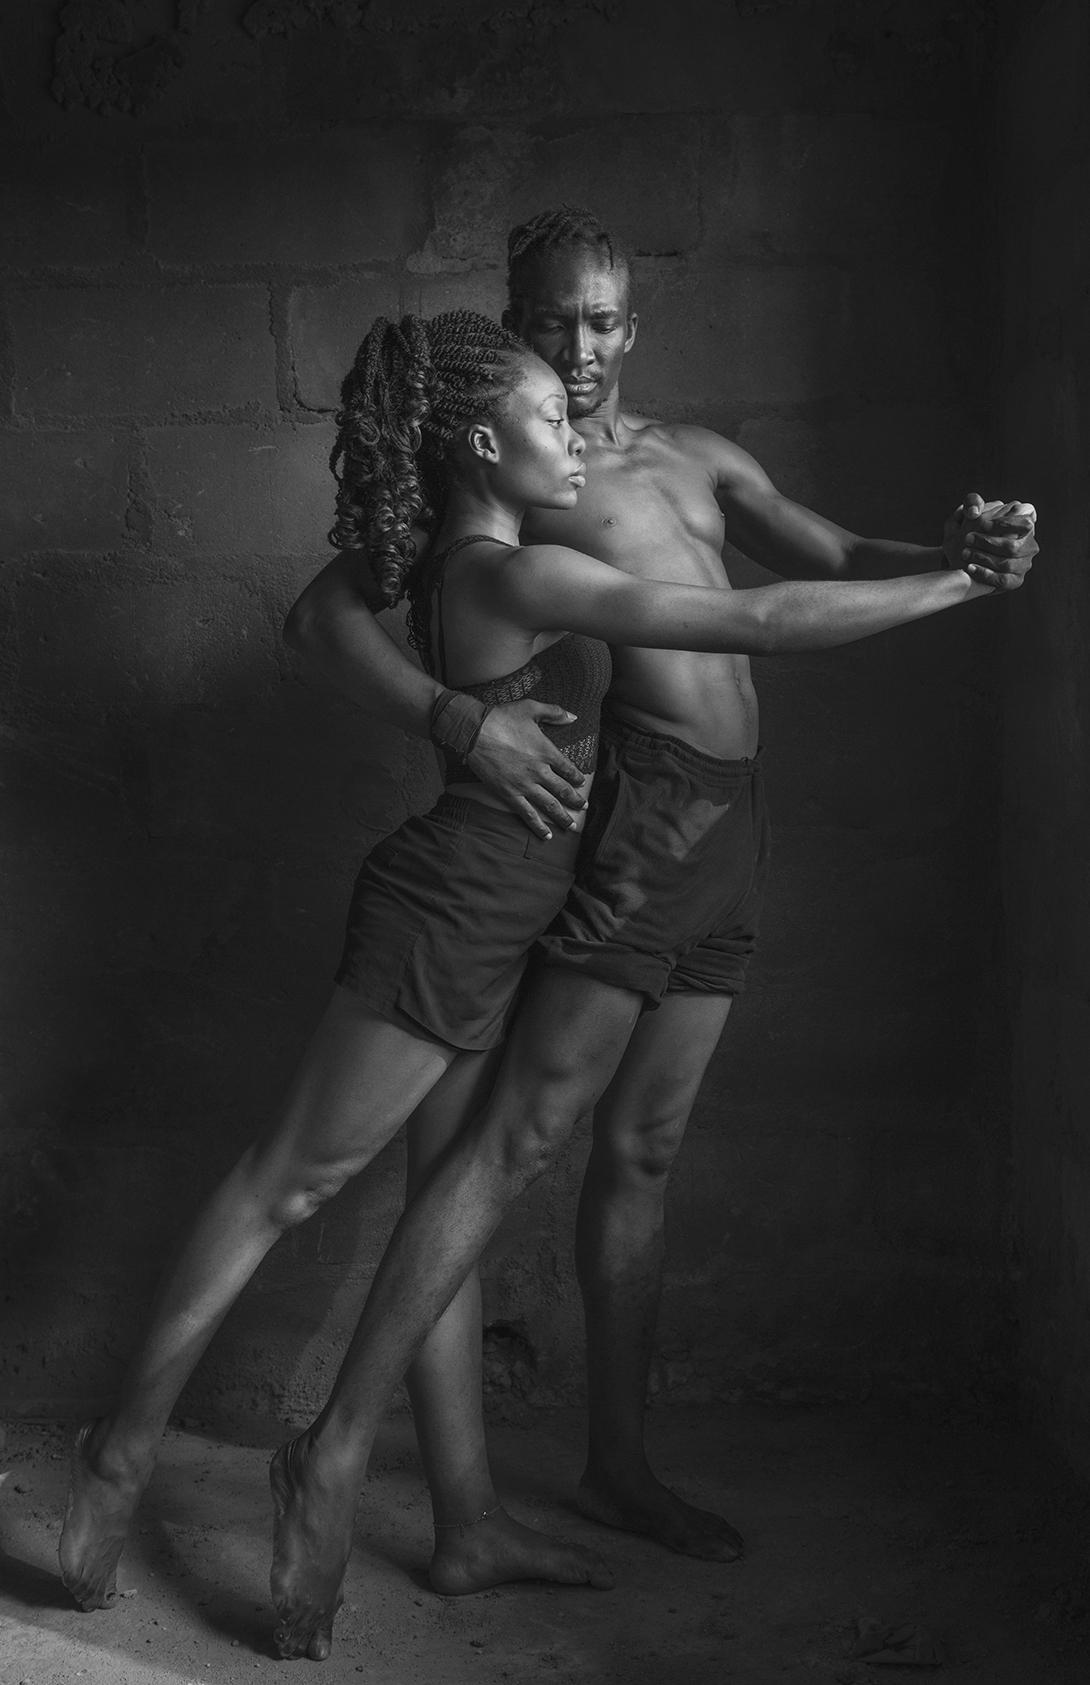 SPA 2018 Roderick Penn, Slim and Chika, 43 x 64 cm,  £350 framed, £150 unframed, All rights reserved